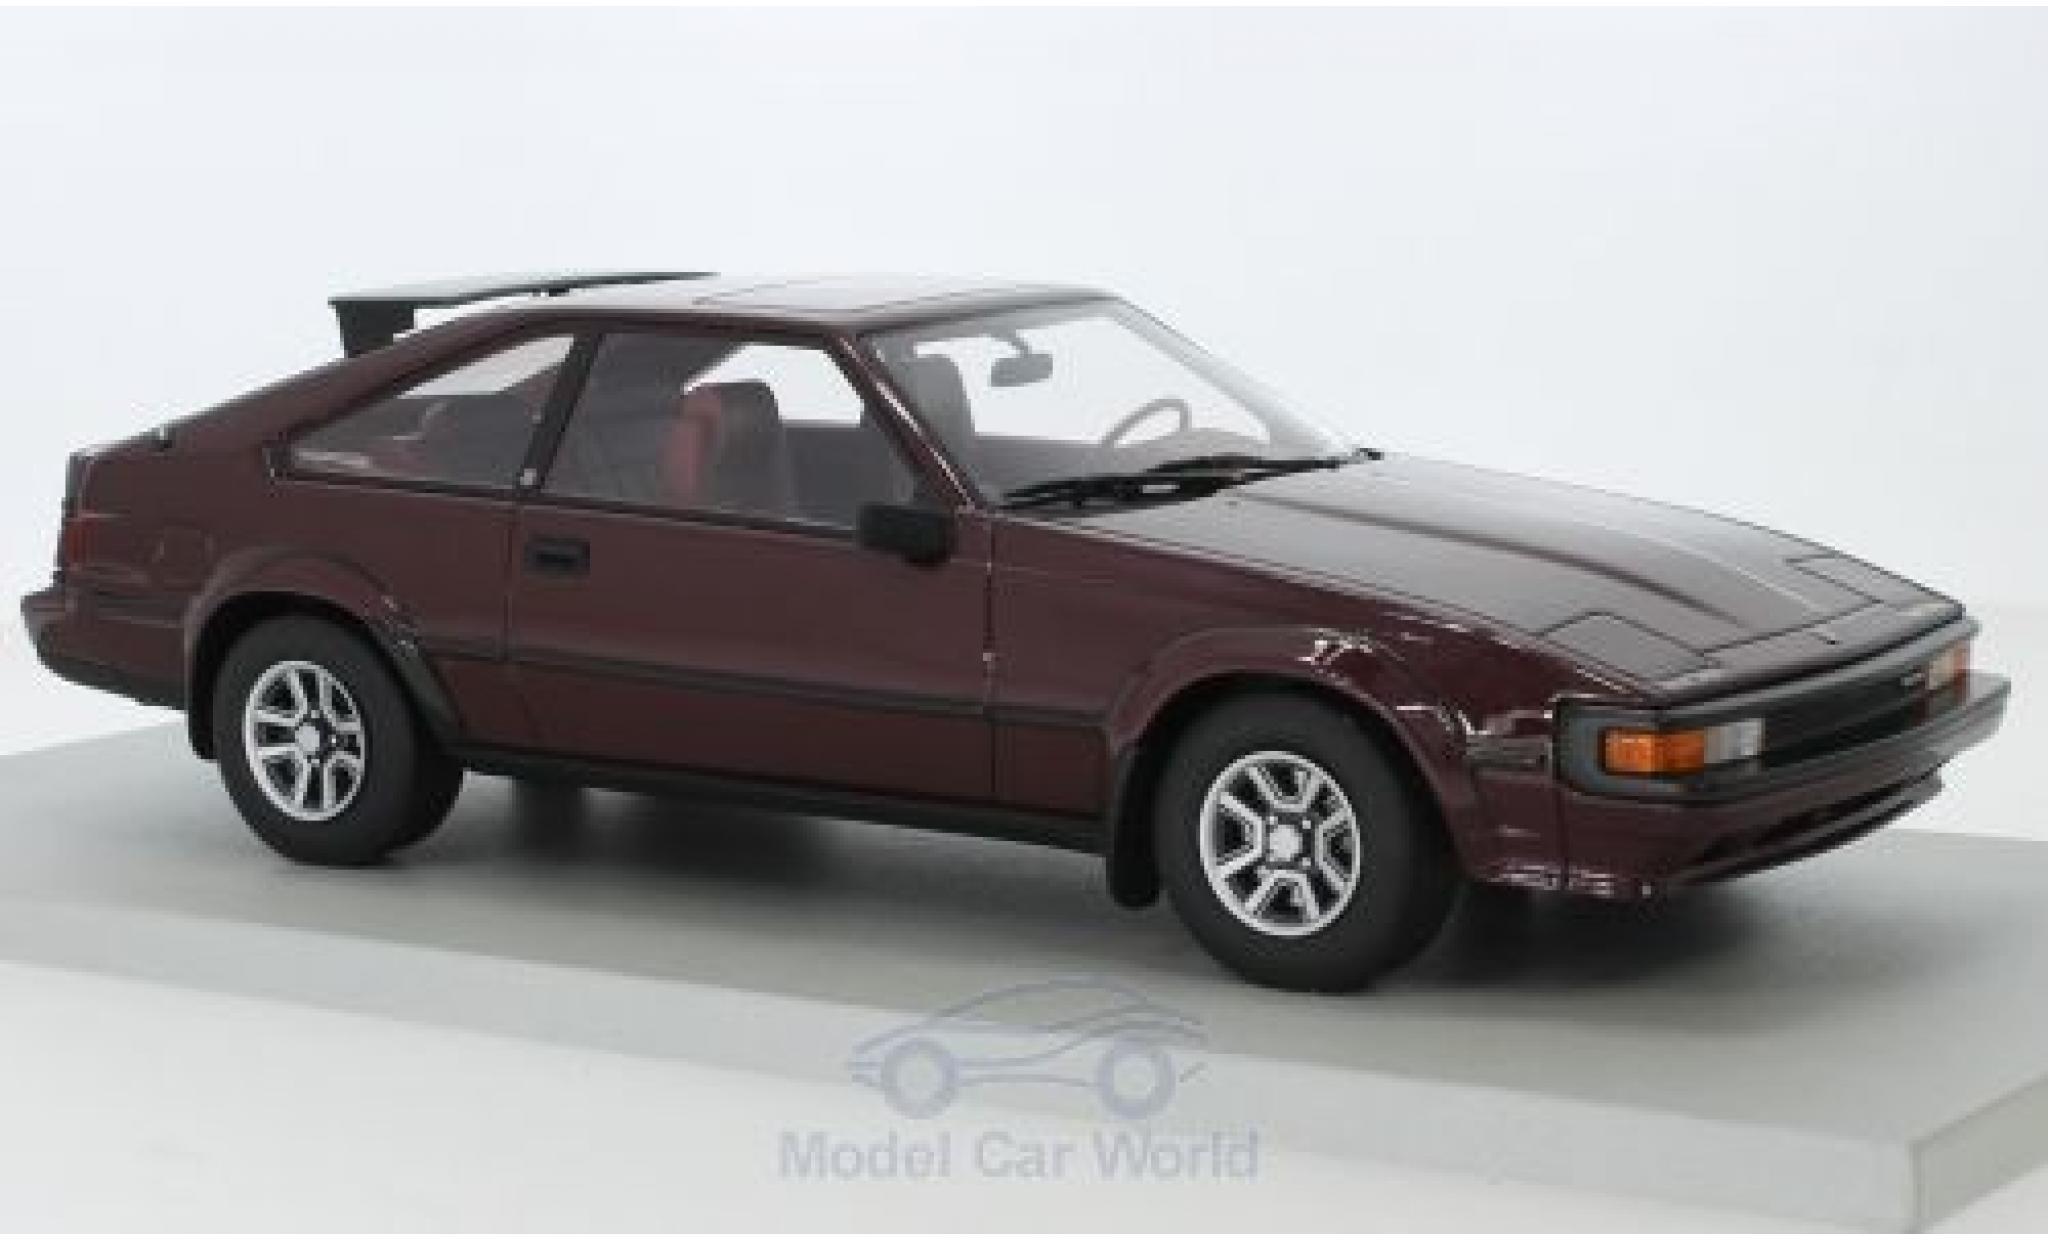 Toyota Celica 1/18 Lucky Step Models Supra MII red